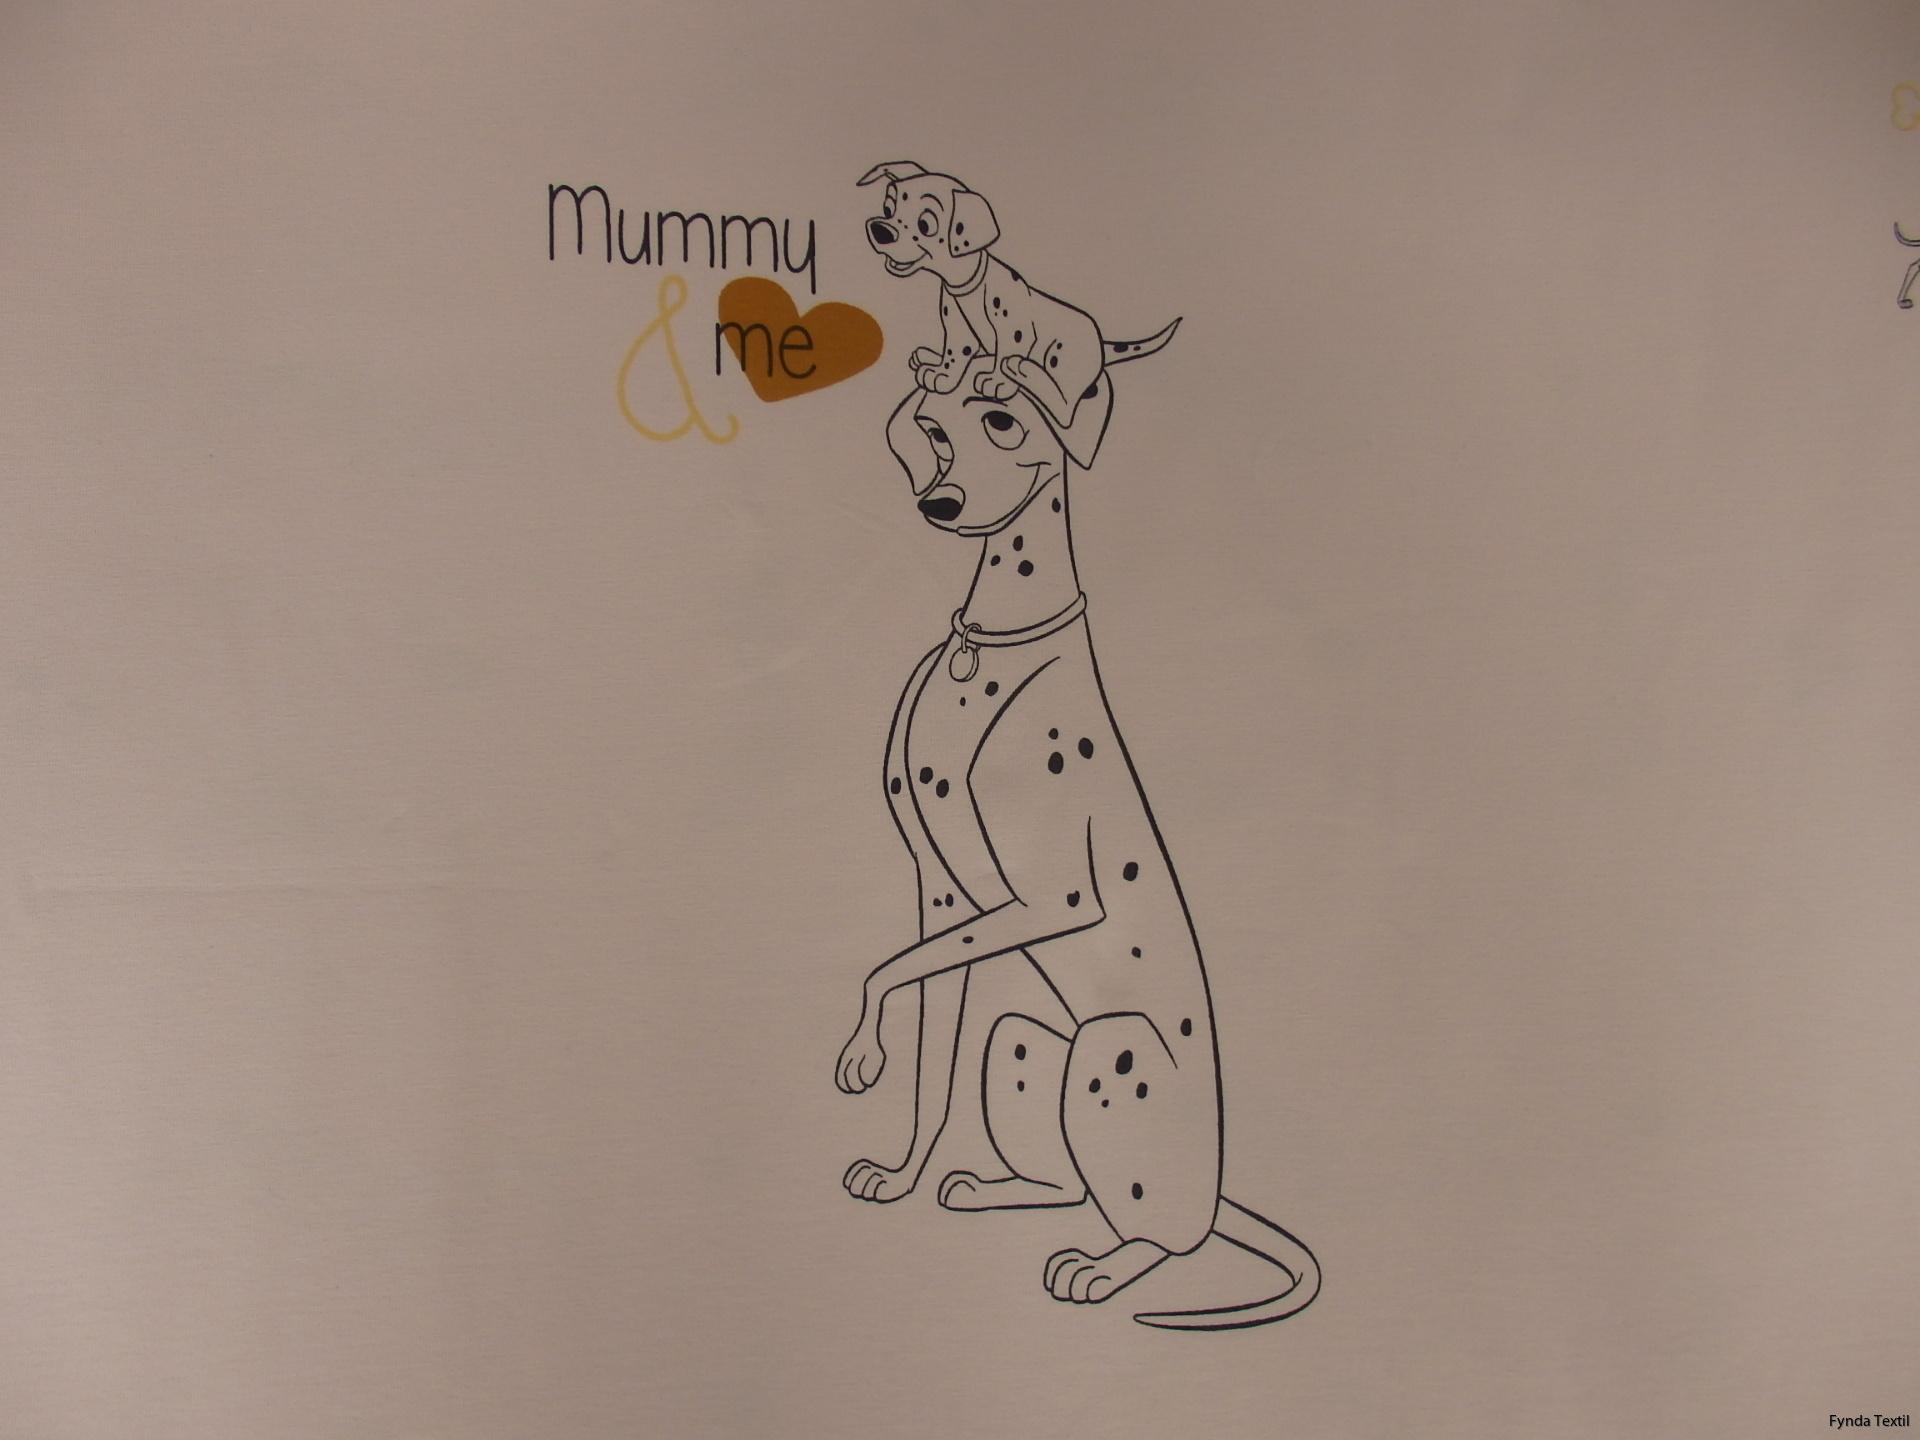 Mummy and Me Ca 8x25 cm